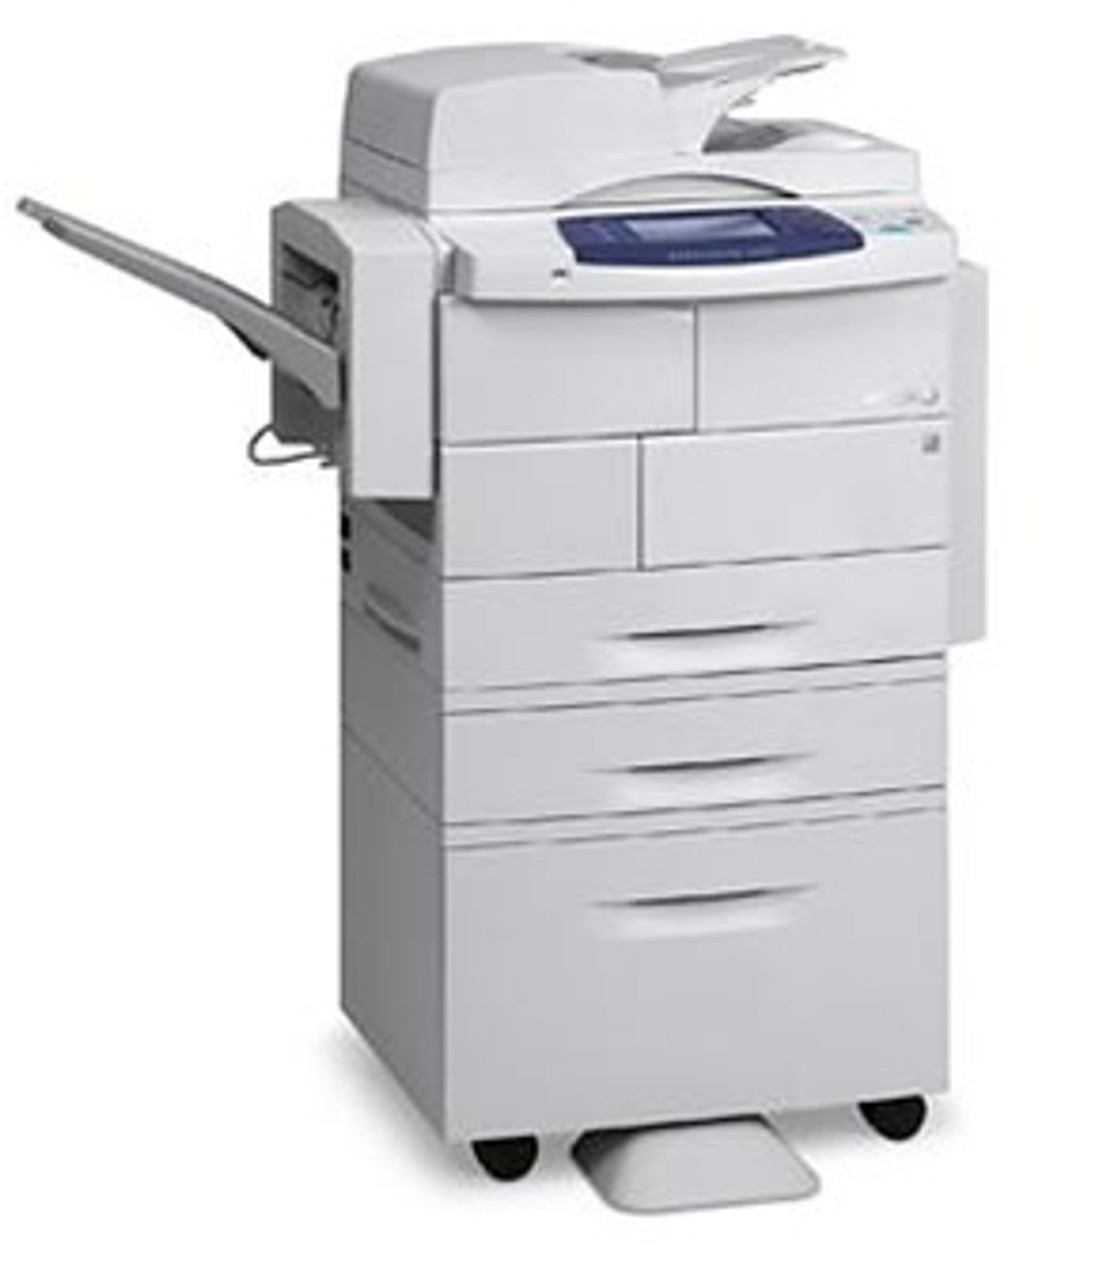 Xerox WC4250XF Copier MFP Laser Printer